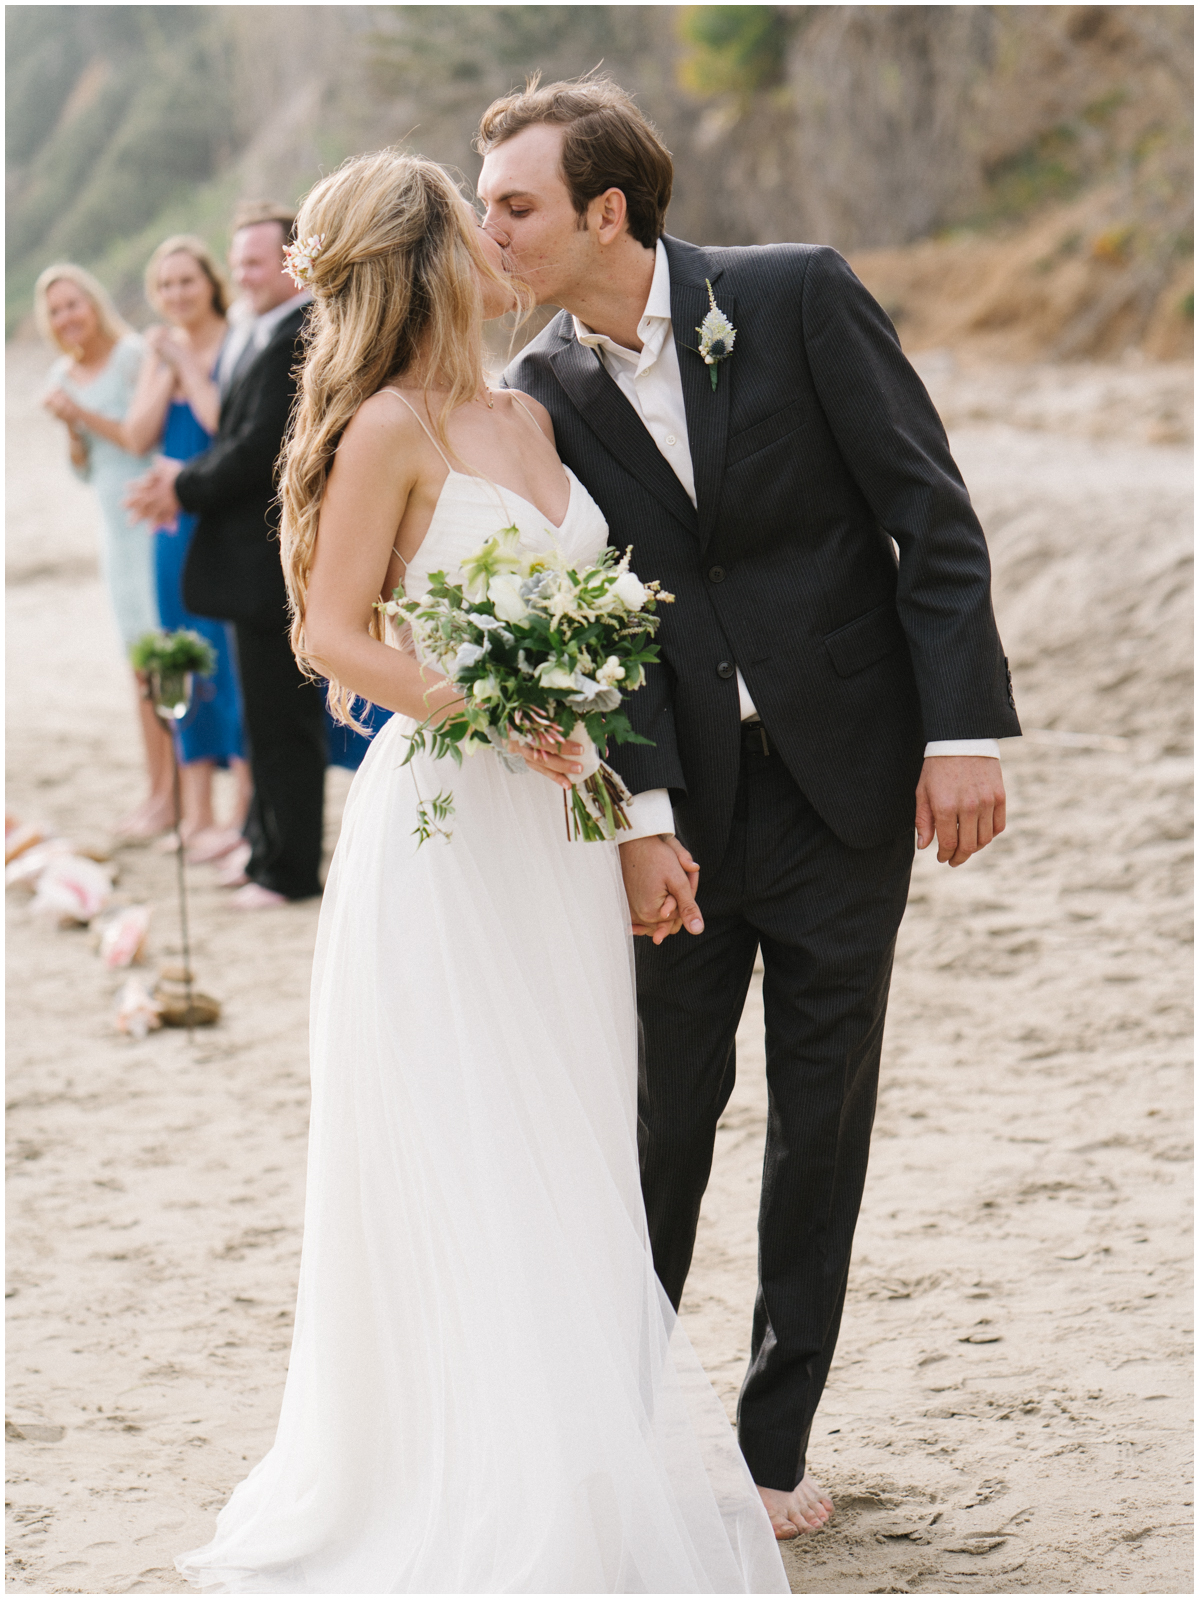 Santa Babara Elopement Wedding Photographer - Pinnel Photography-01-11.jpg